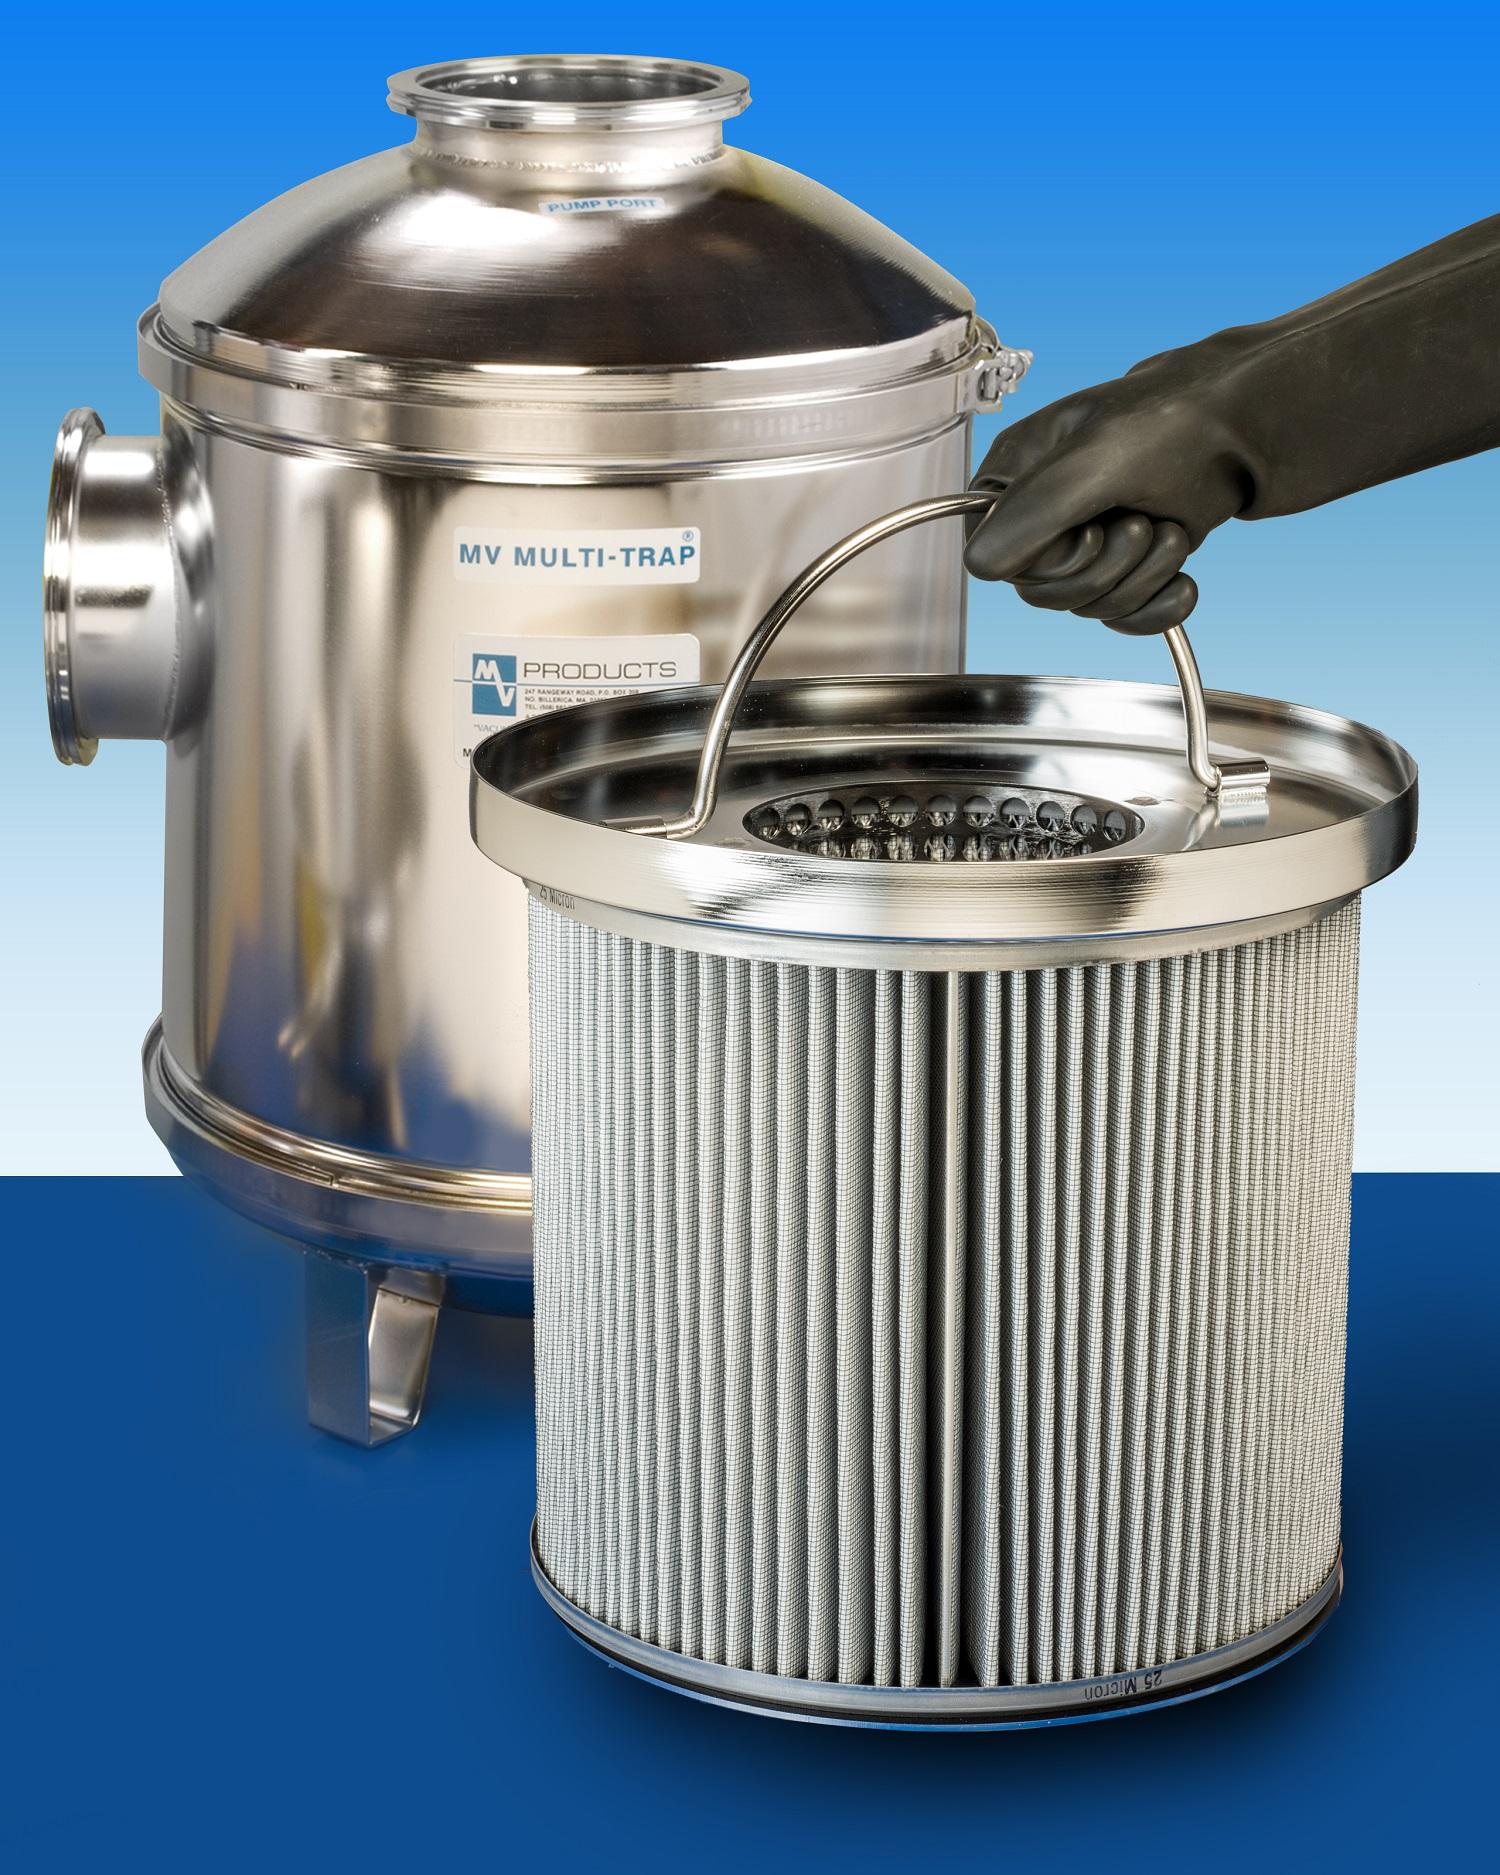 Klystron Modulator From Diversified Technologies Features Auto 45kv 3ka Gto Thyristor Vacuum Pump Inlet Trap Boasts High